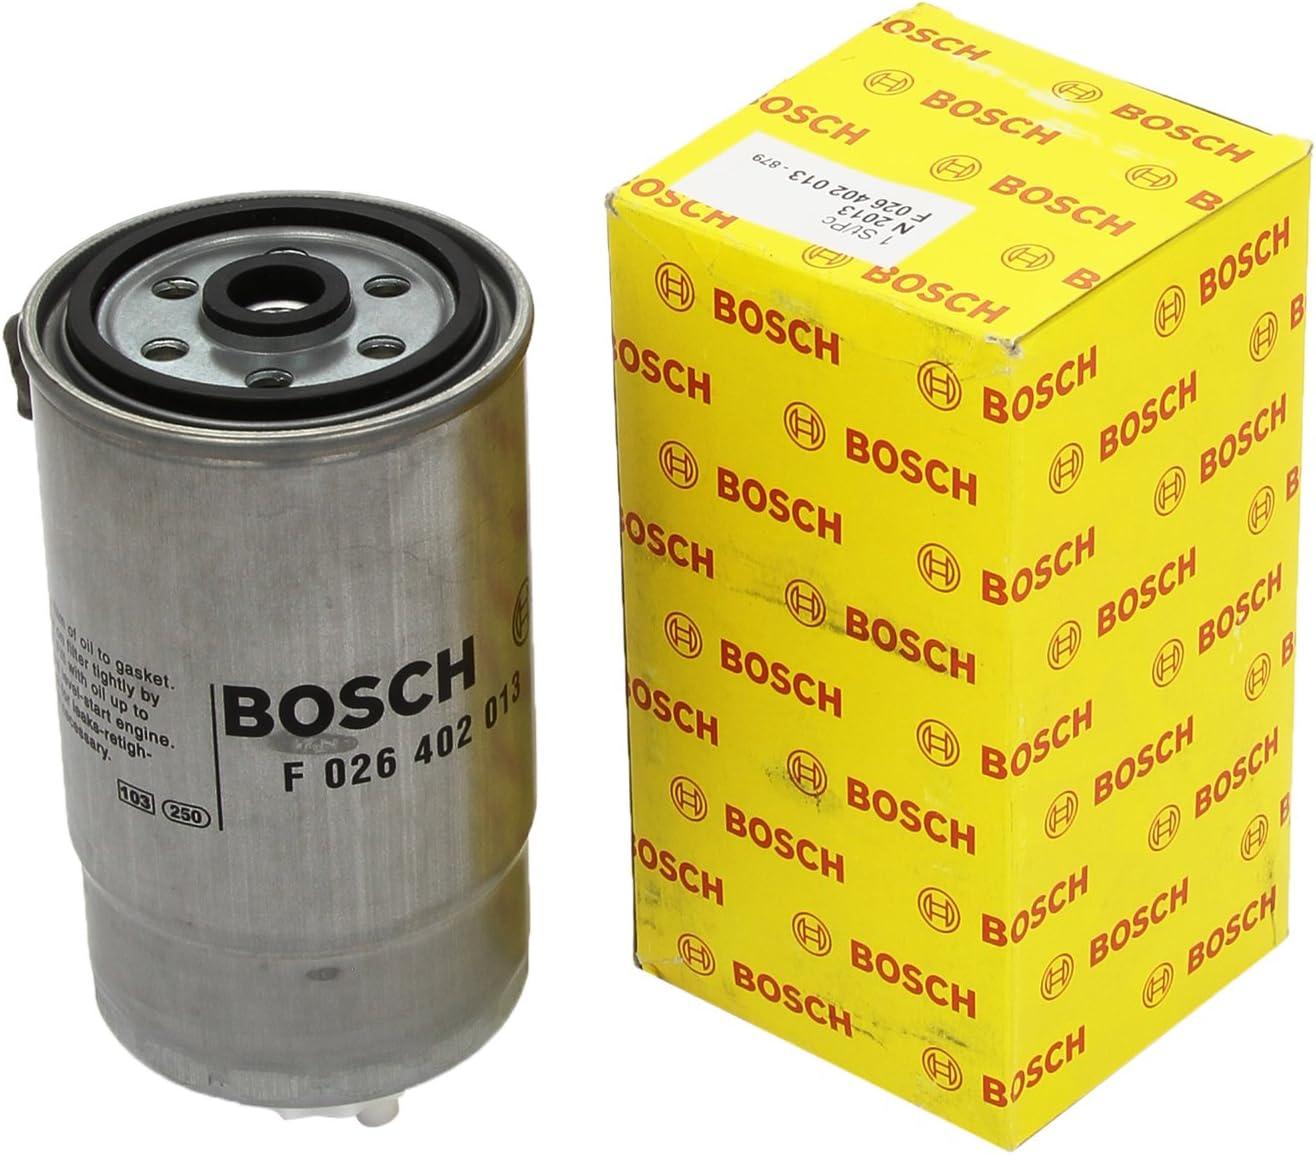 Bosch N2013 Filtre /à carburant diesel PSA